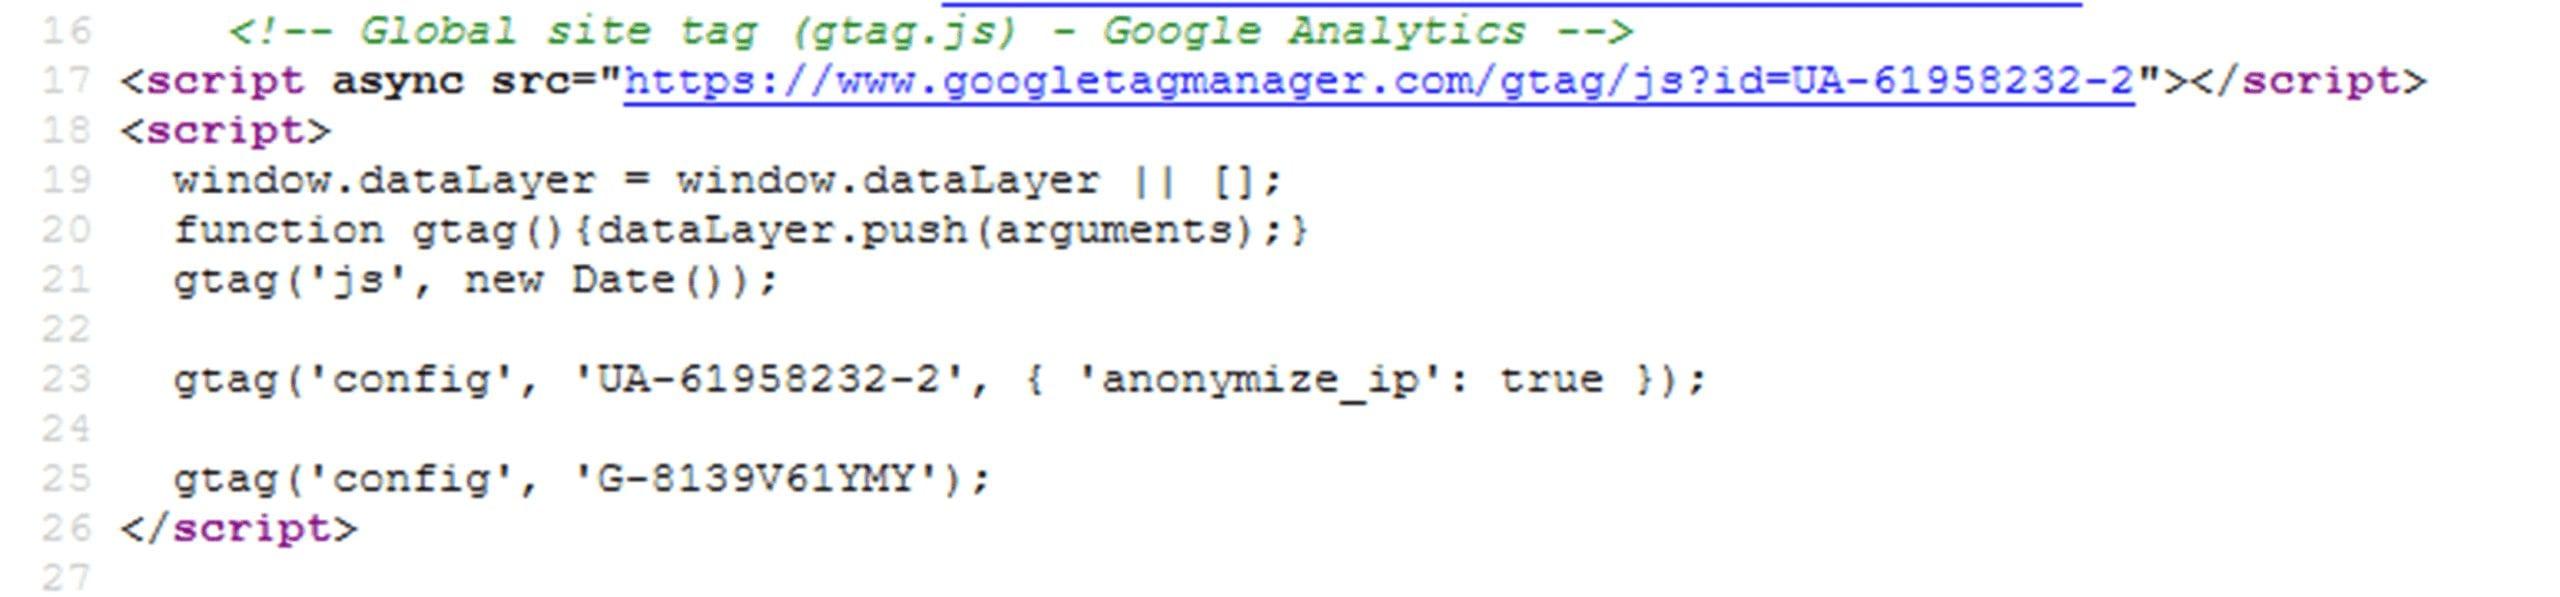 Code-Snippet Analytics 4